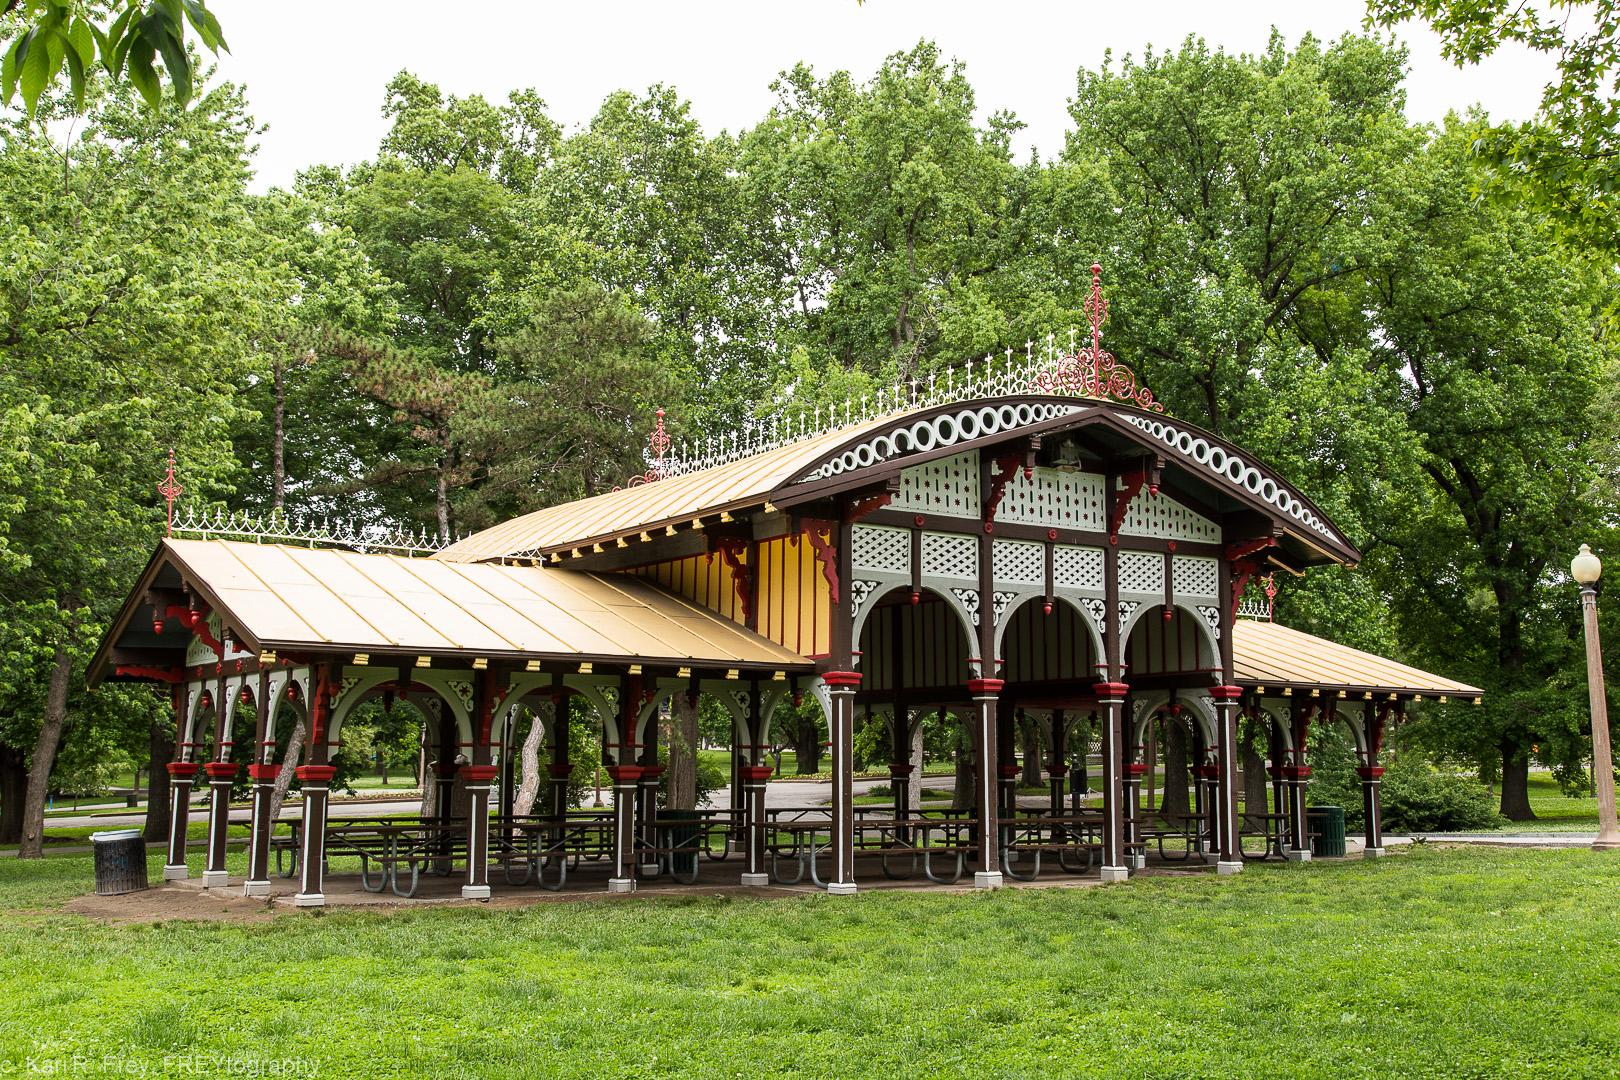 Sons of Rest Pavilion